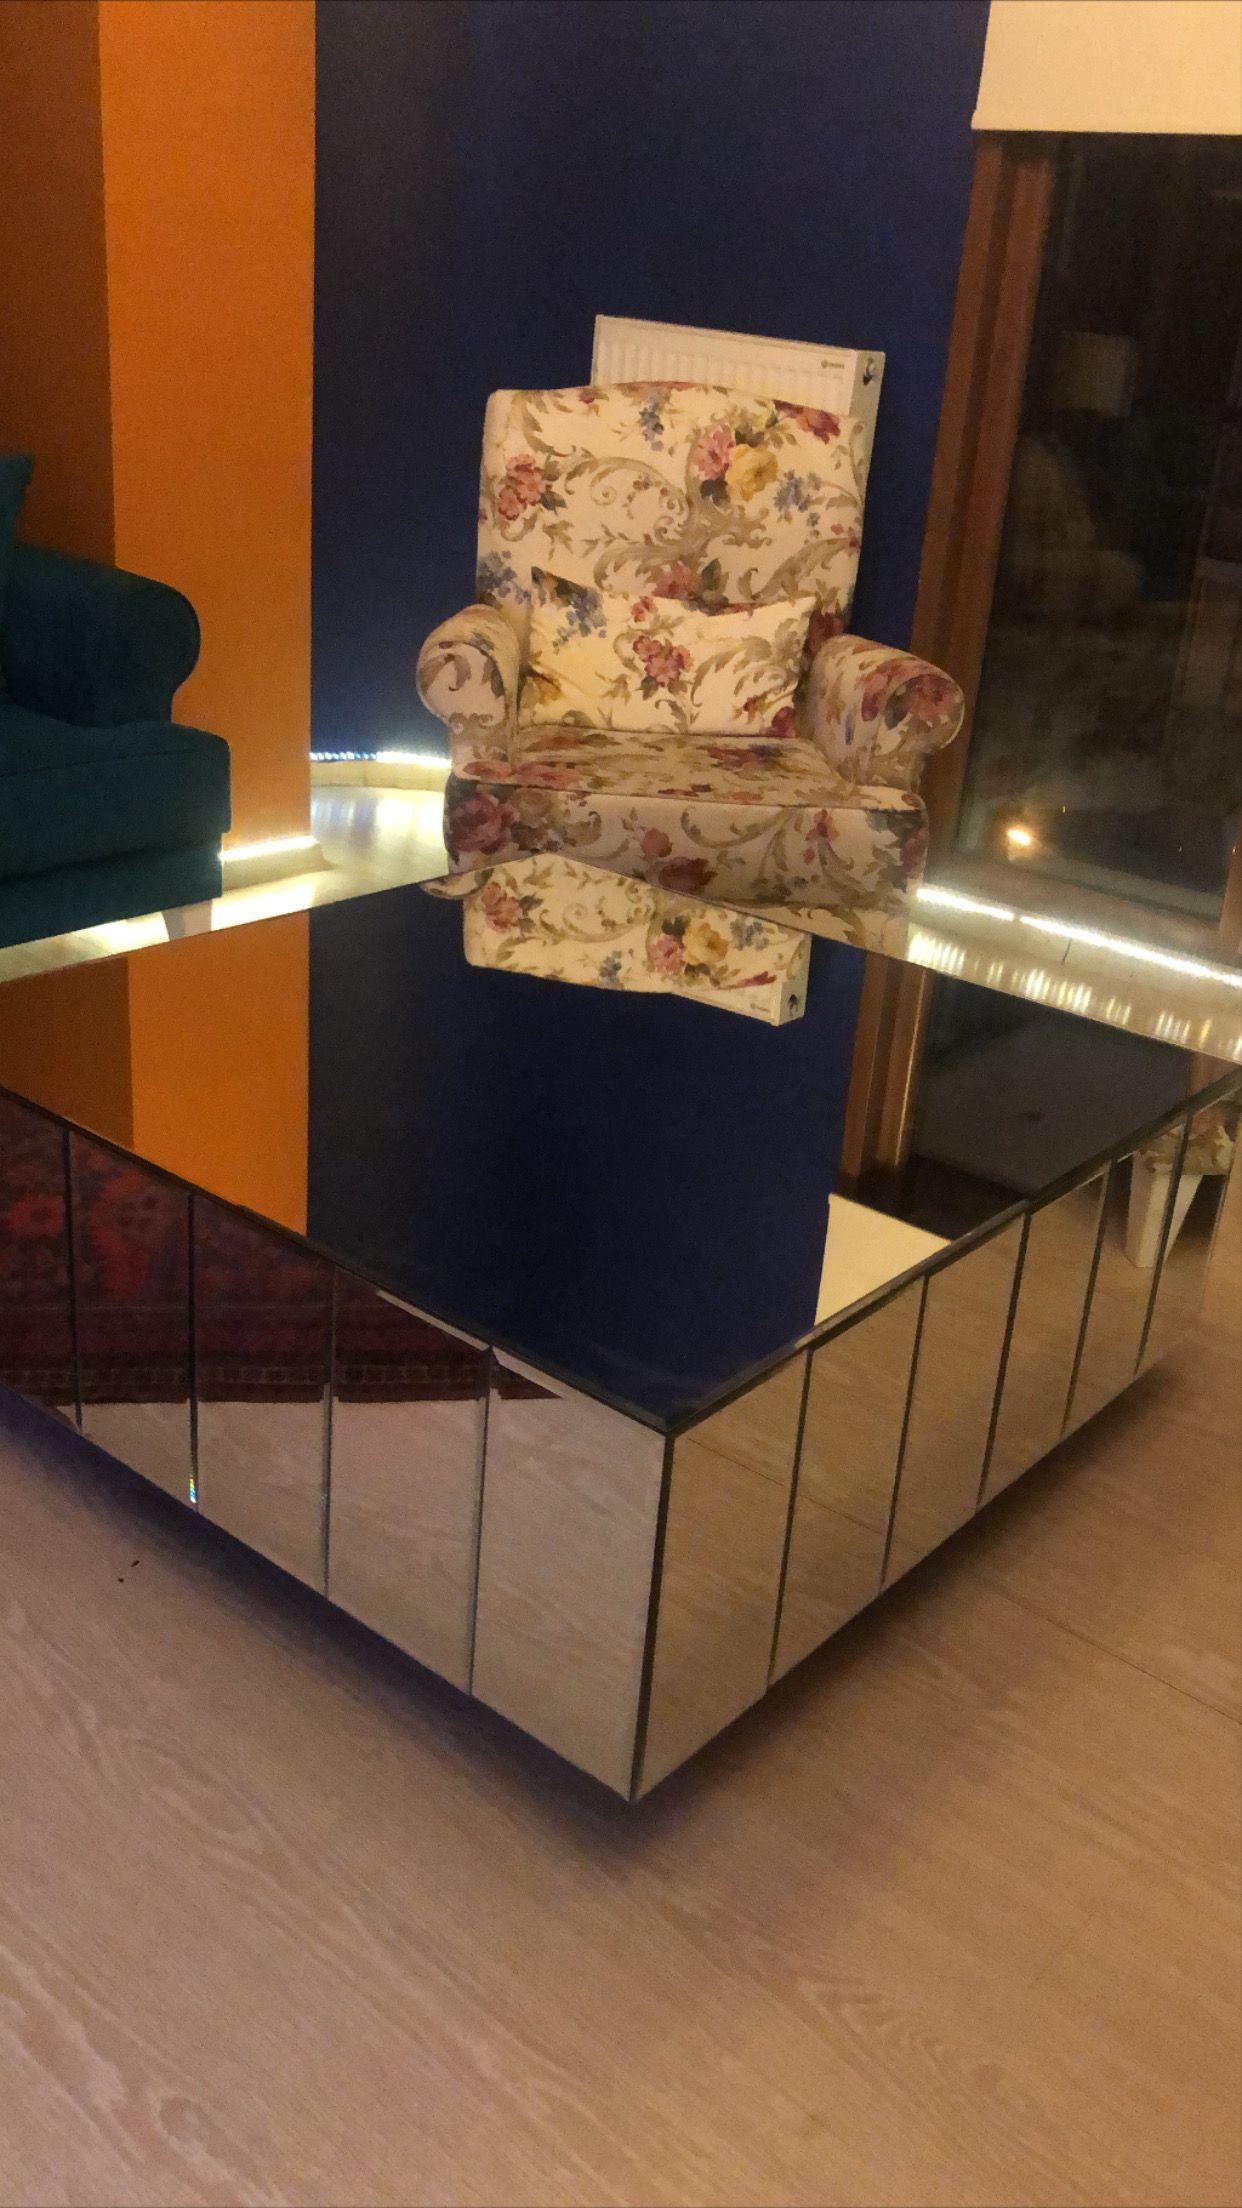 Aynalı Orta Sehpa  #luxury #coffeetable #sehpa #homedecor #evdekoru #evaksesuar